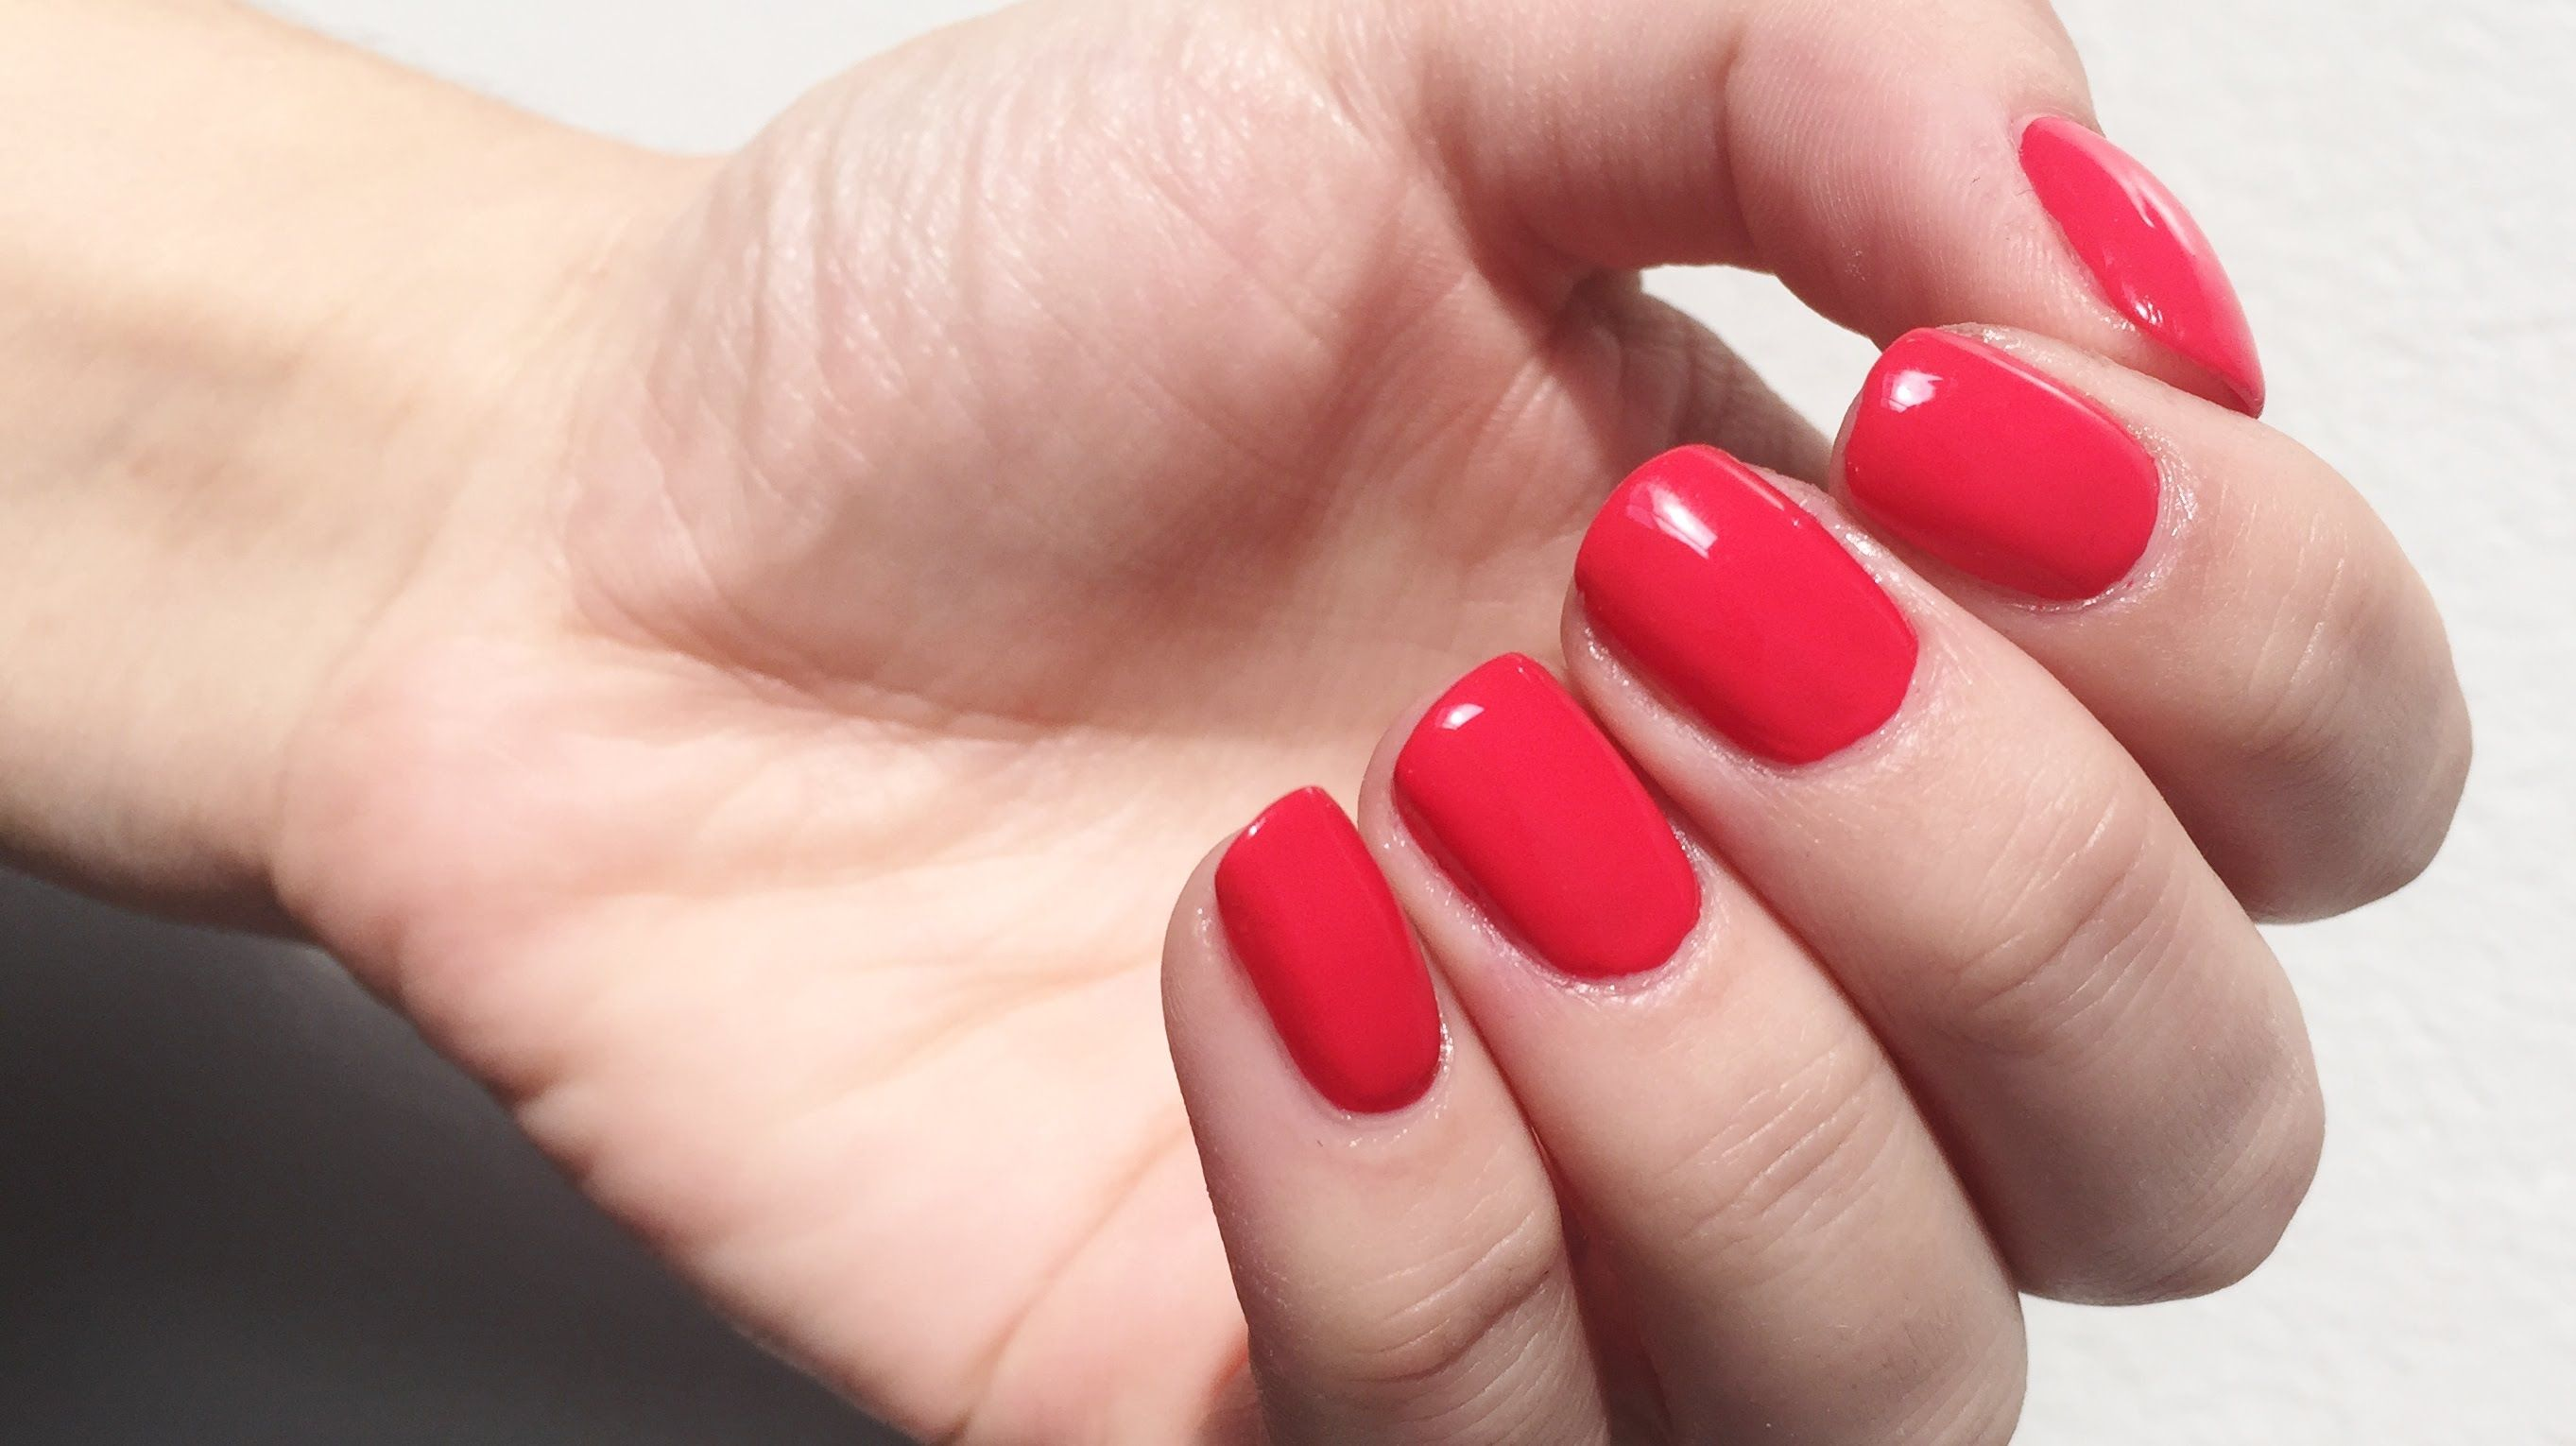 How to make regular nail polish look like gel nails how to how to make regular nail polish look like gel nails how to paint your nails perfectly prinsesfo Images